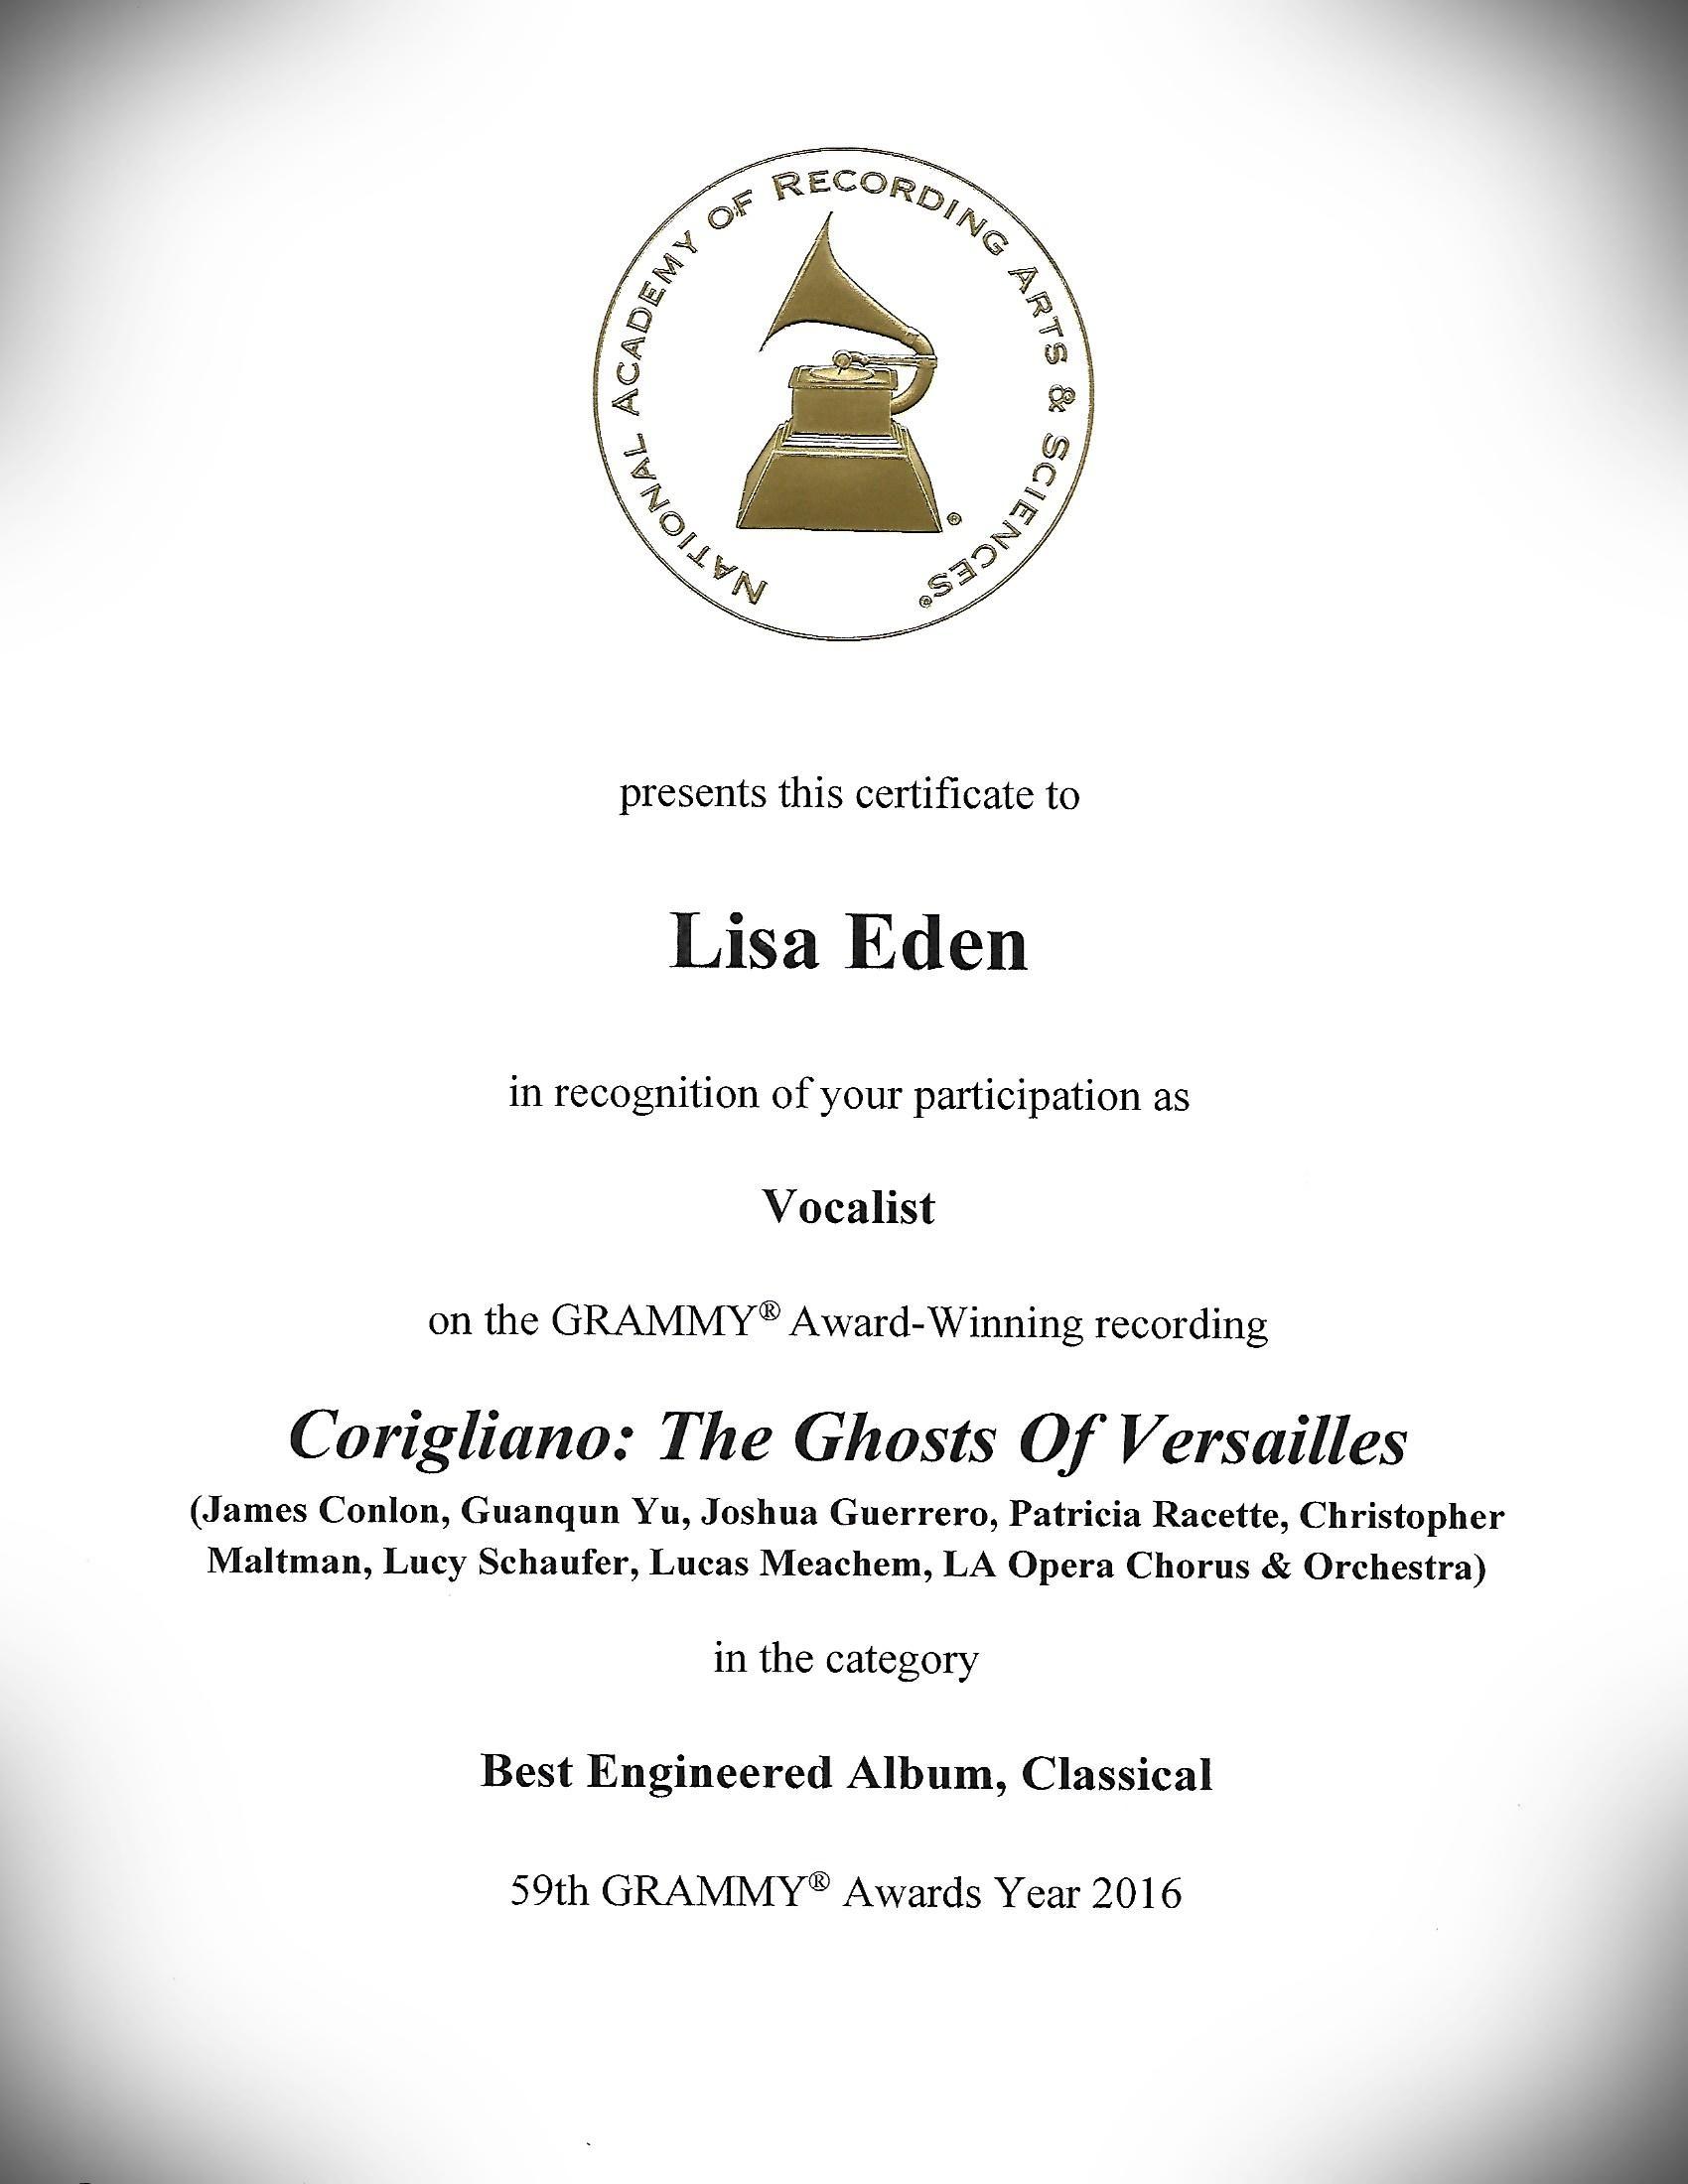 Grammy Award Certificate - Best Engineer